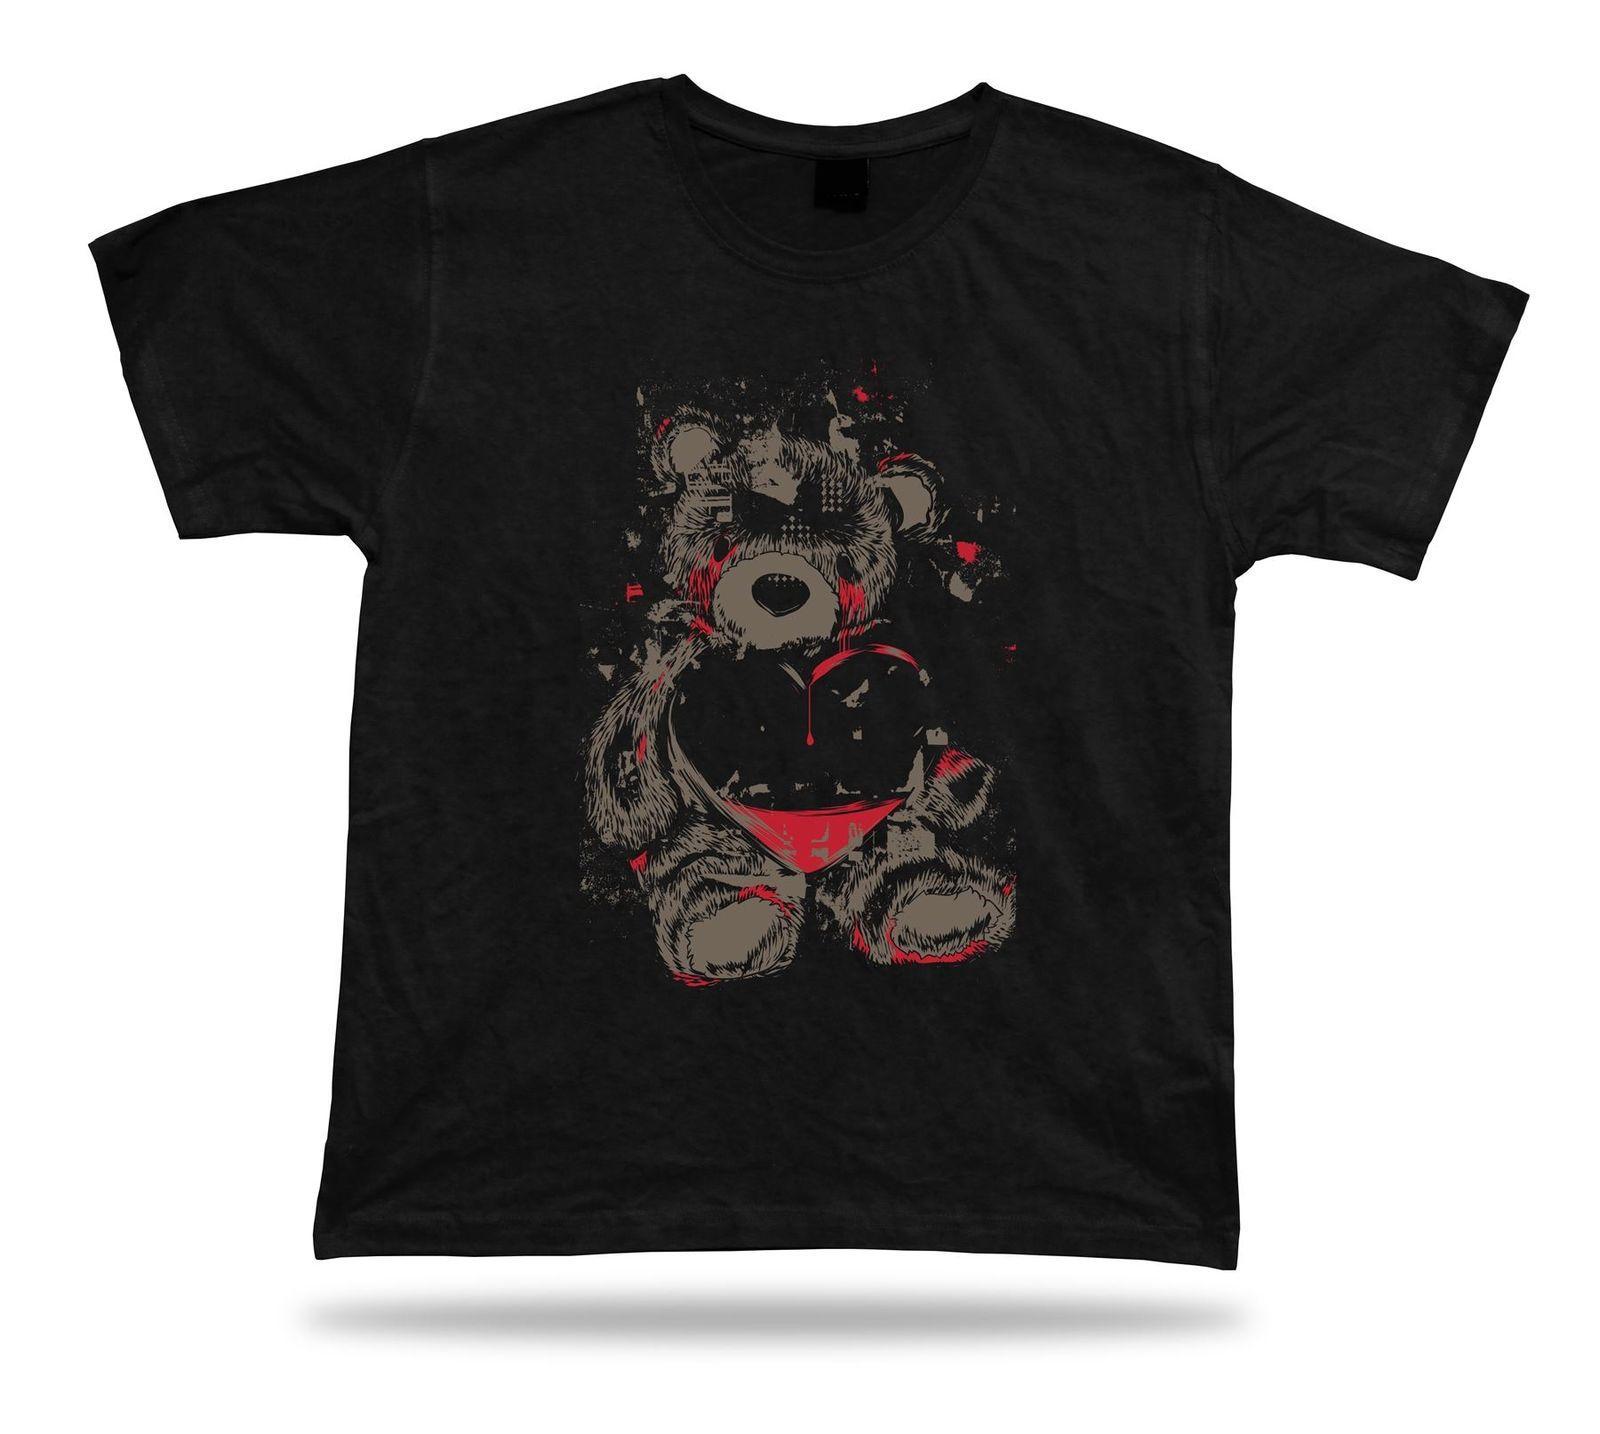 0da7727dde7c Teddy Bear Crying Heart Love Care stylish Tshirt tee shirt vector birthday  gift